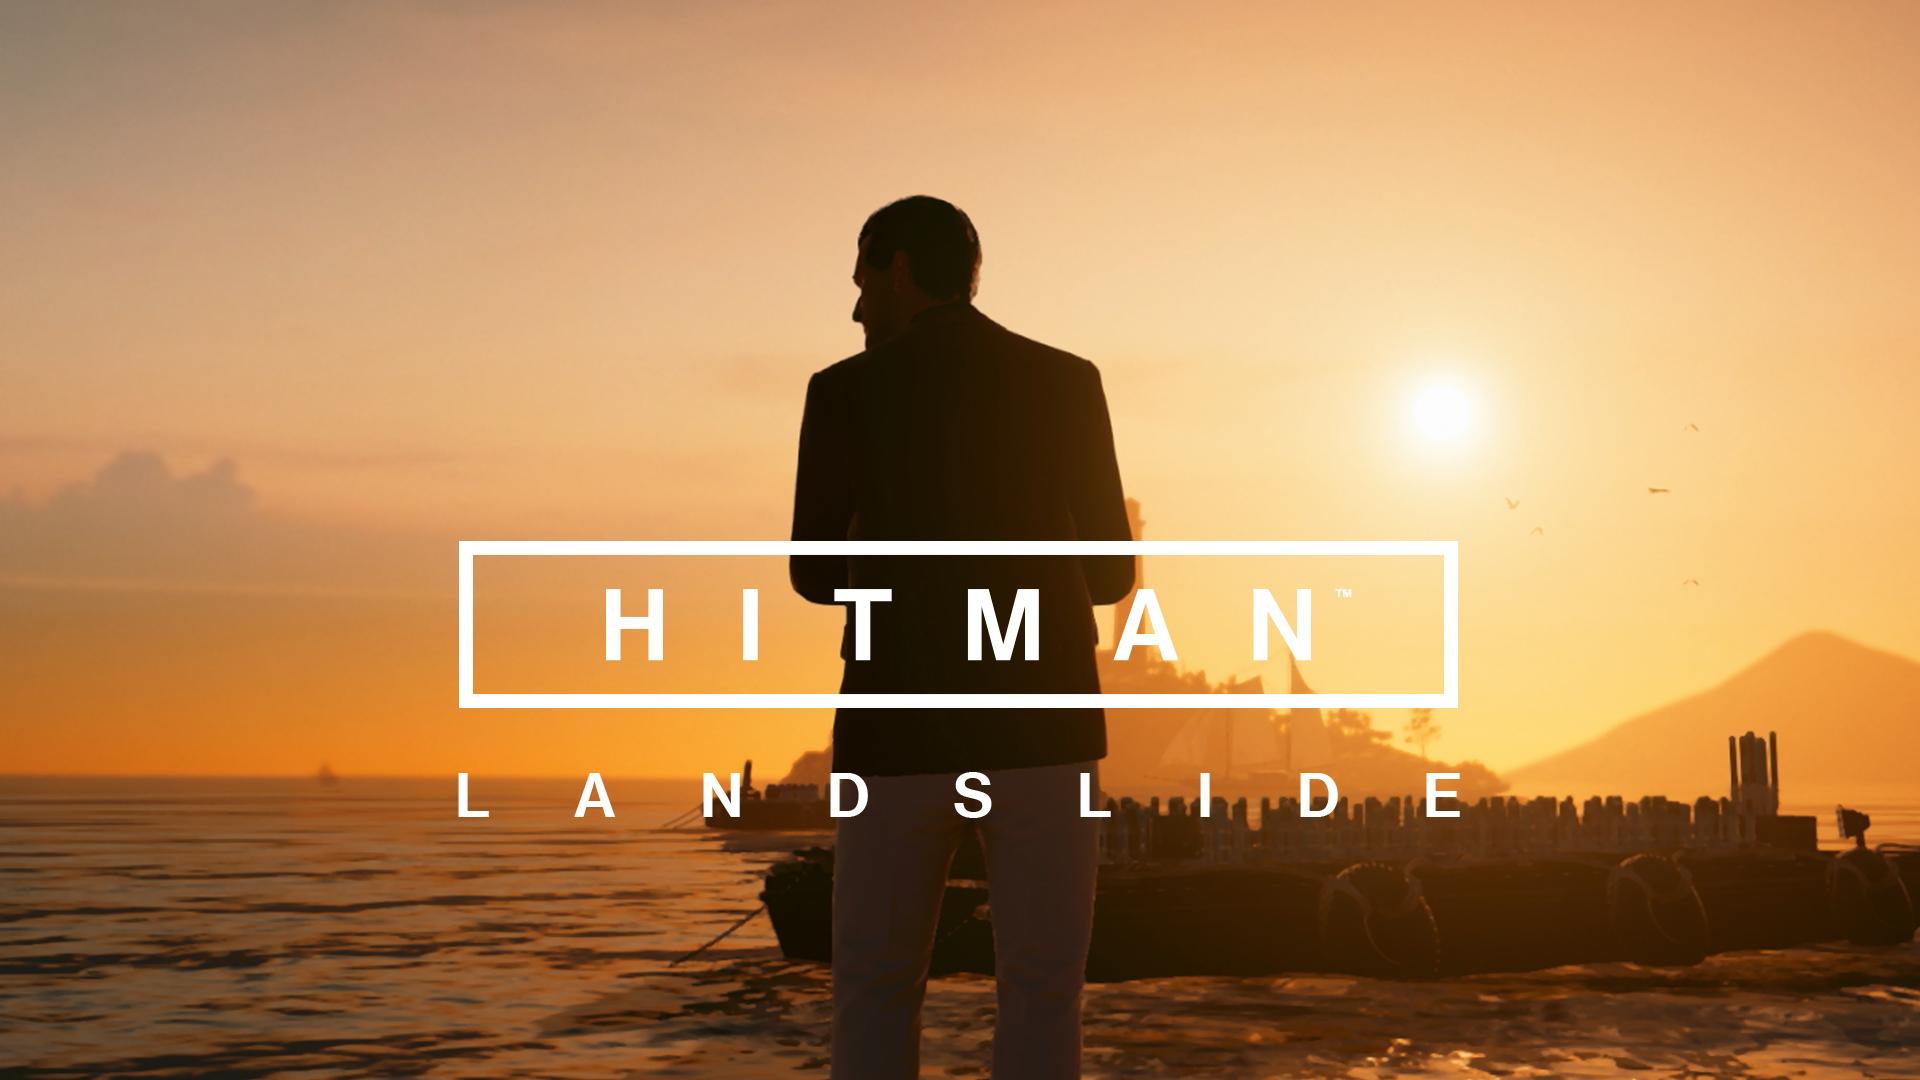 HITMAN_Artwork_Landslide_Teaser_1920x1080_26012017_1485424454